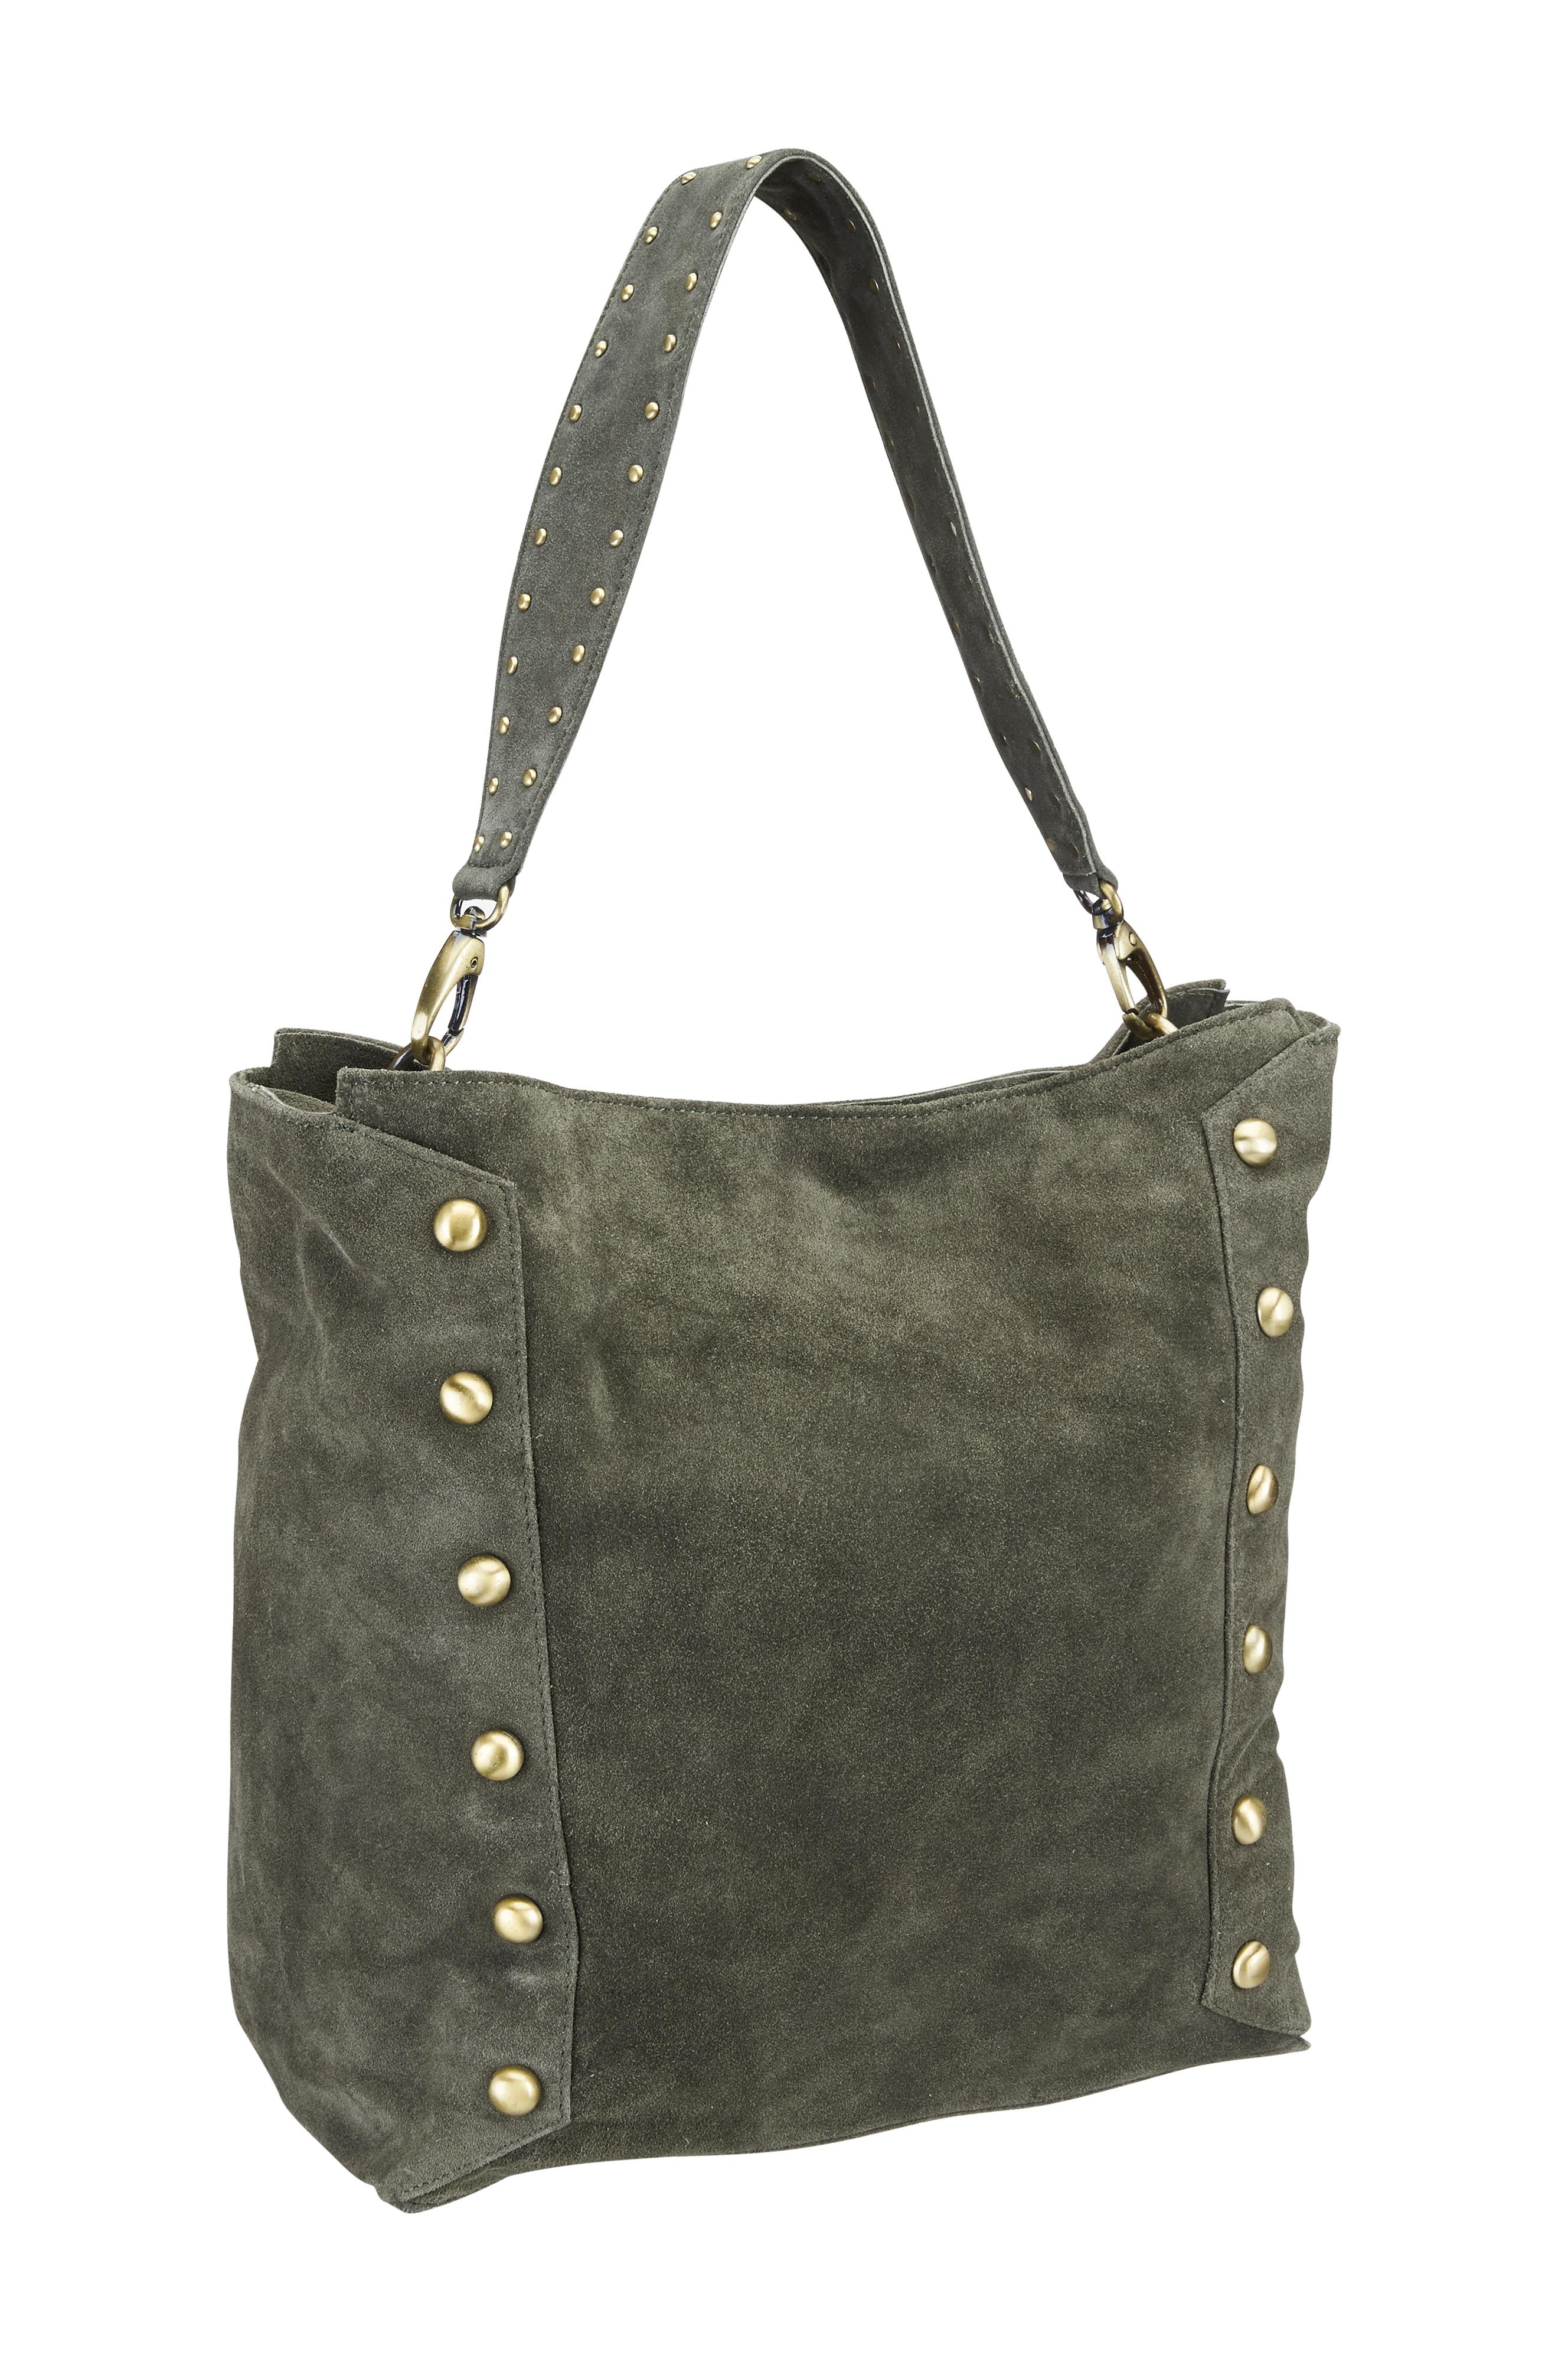 Ellos Collection Santa Fe Shopper -mokkalaukku - Vihreä - Naiset - Ellos.fi 16974b4029